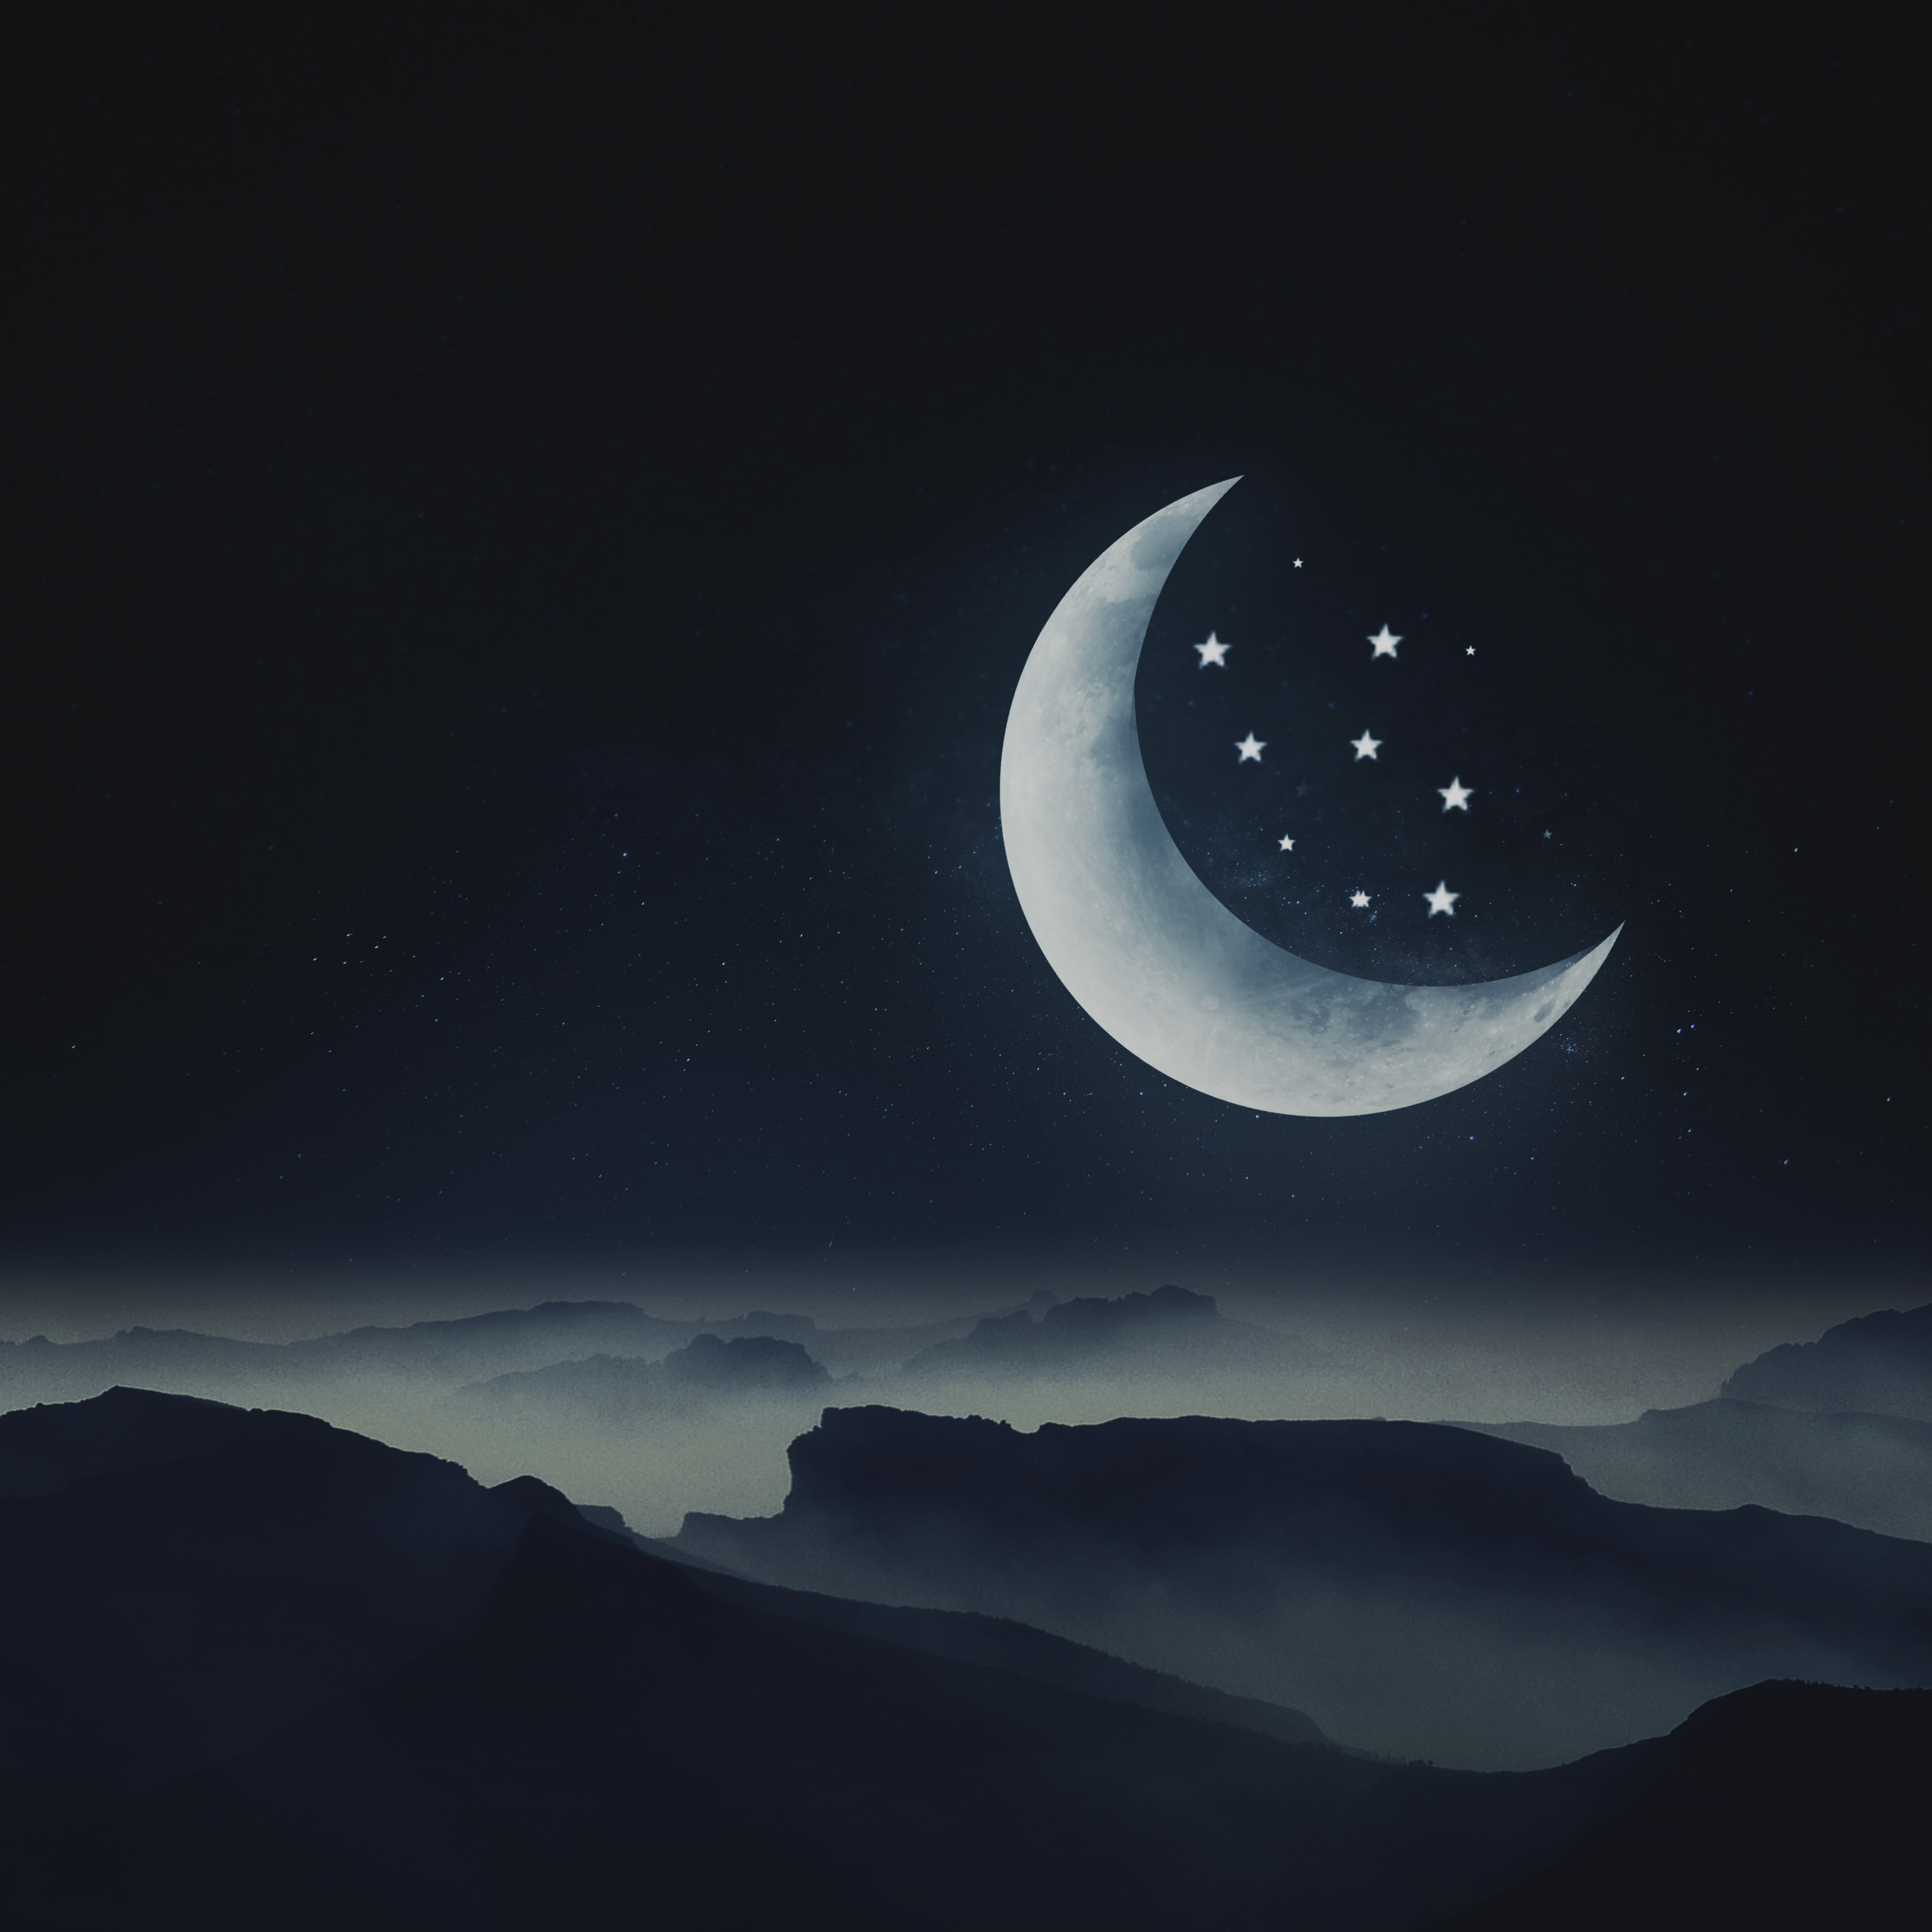 Half moon Wallpaper 20K, Stars, Mountains, Night, Cold, Aesthetic ...